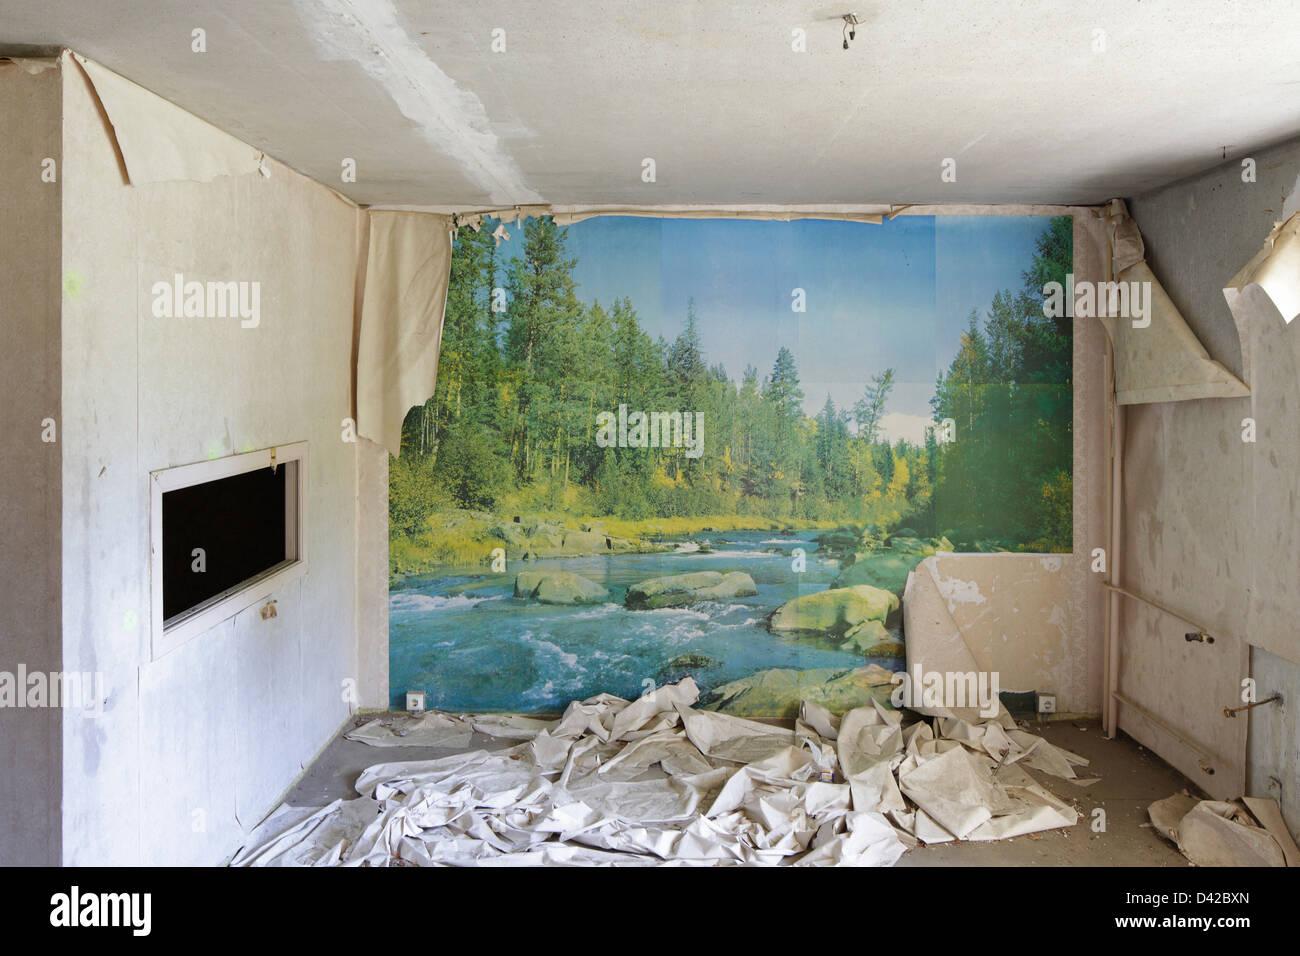 Gross Dölln, Germany, landscape design on a Mural - Stock Image